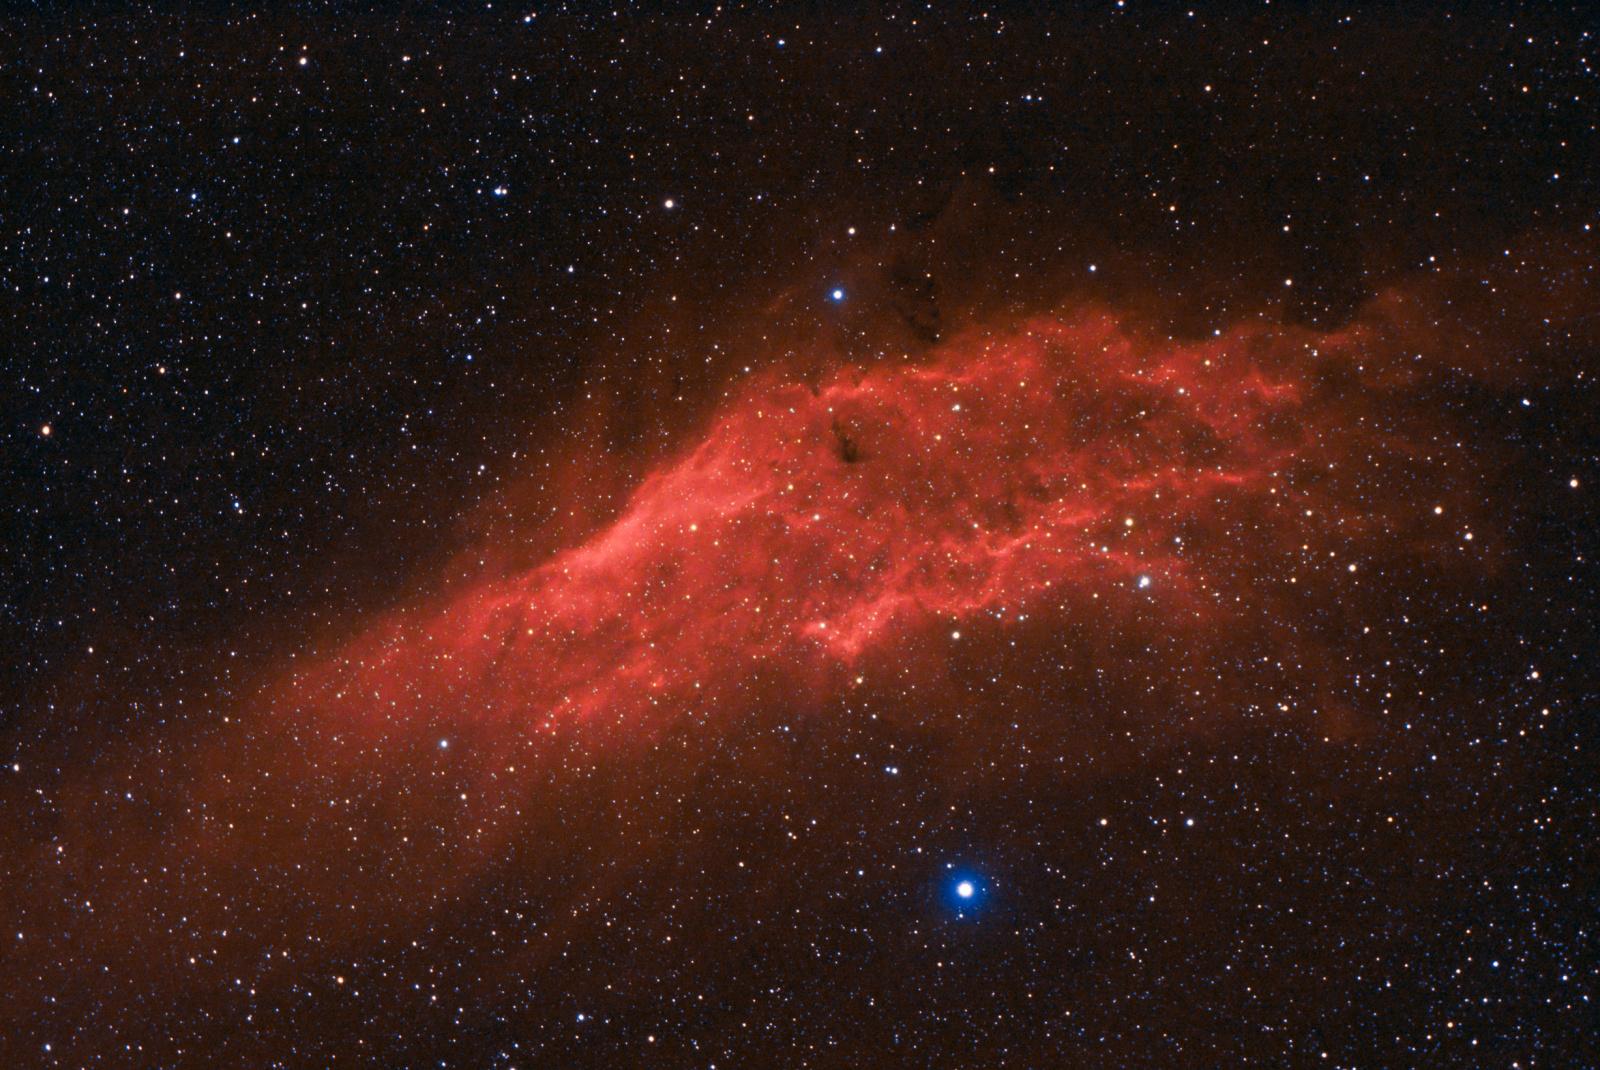 NGC1499-HaRGB-St-v2.thumb.jpg.45702f26f7ea958a4f62bd6e7e2c9992.jpg